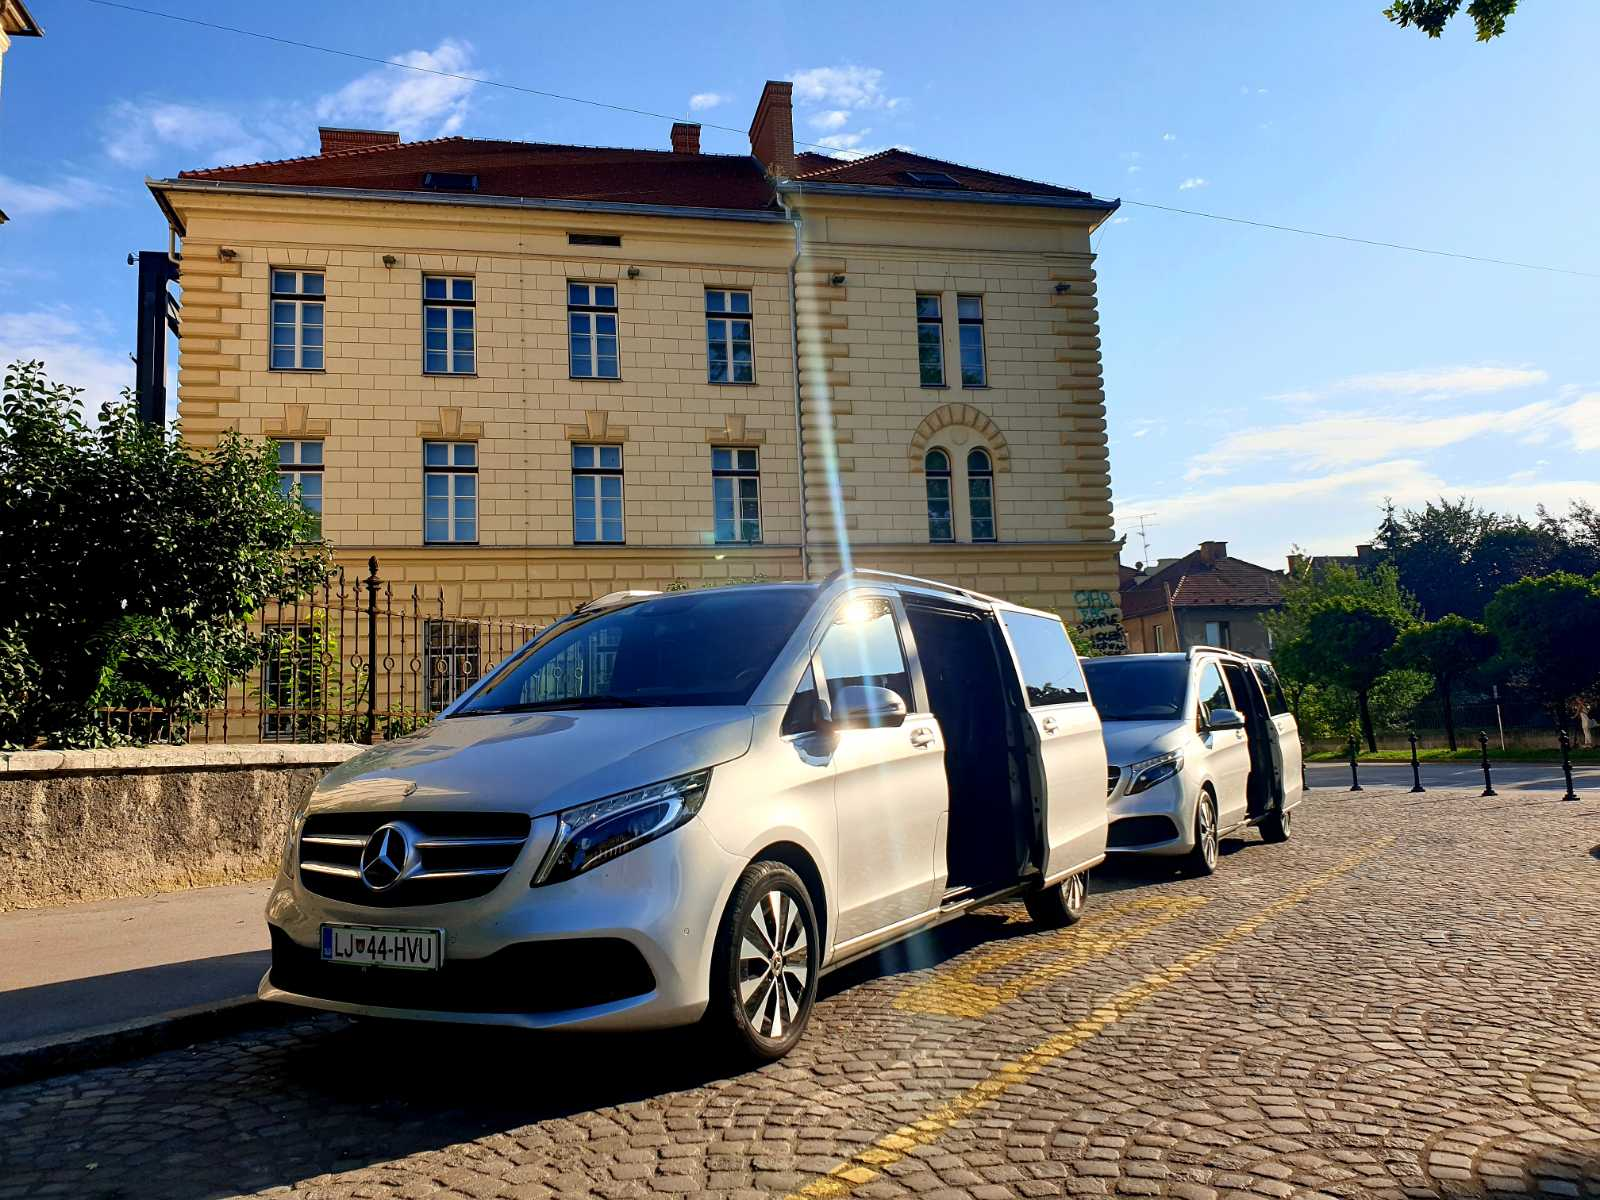 rental of Mercedes-Benz V Class or similar business-class vans